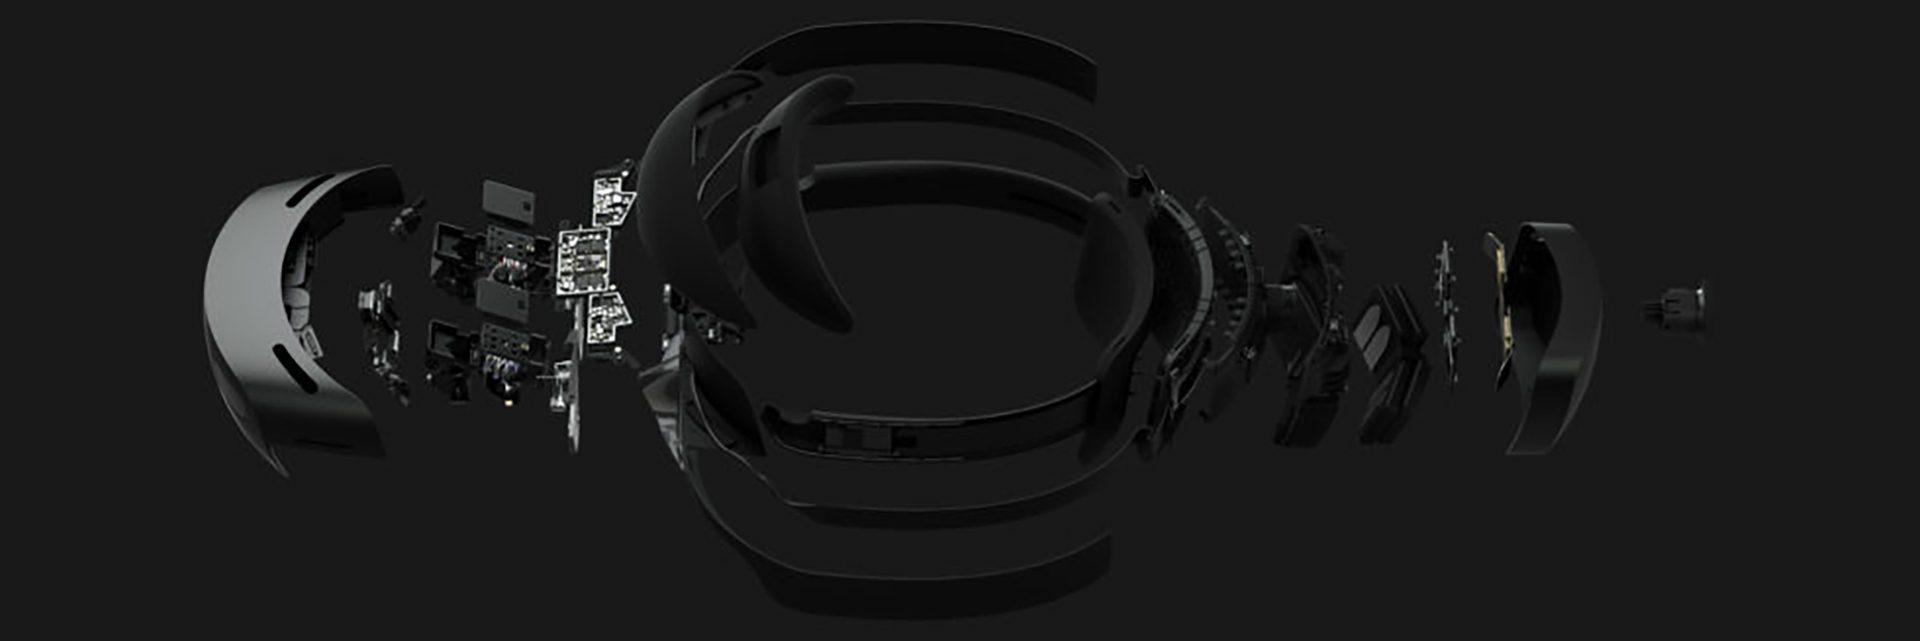 Microsoft HoloLens 2 Insight